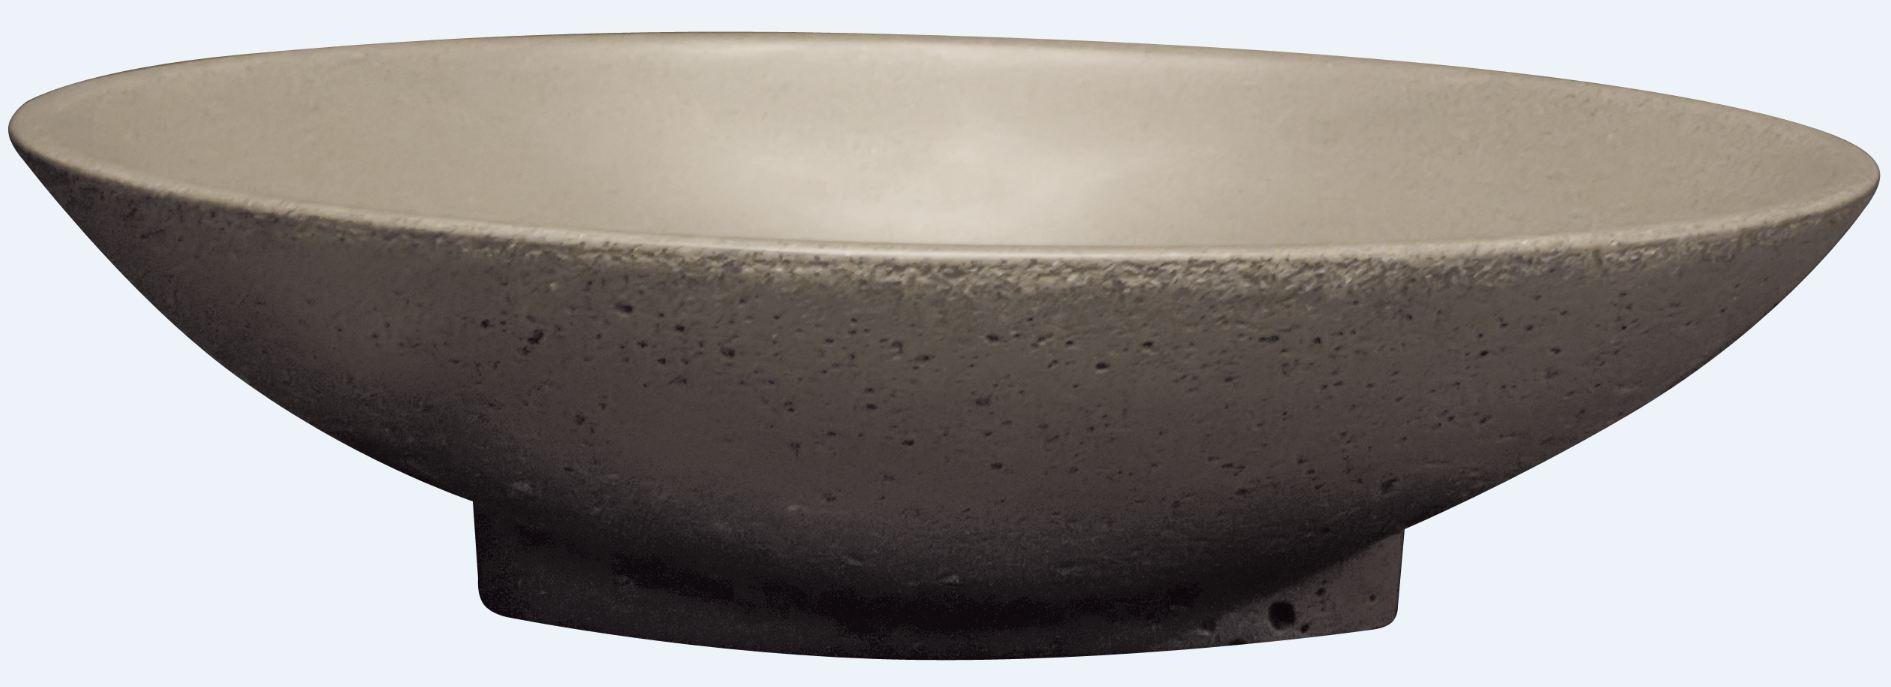 Best Design Aquastone Elisse opbouw waskom 52cm Lava